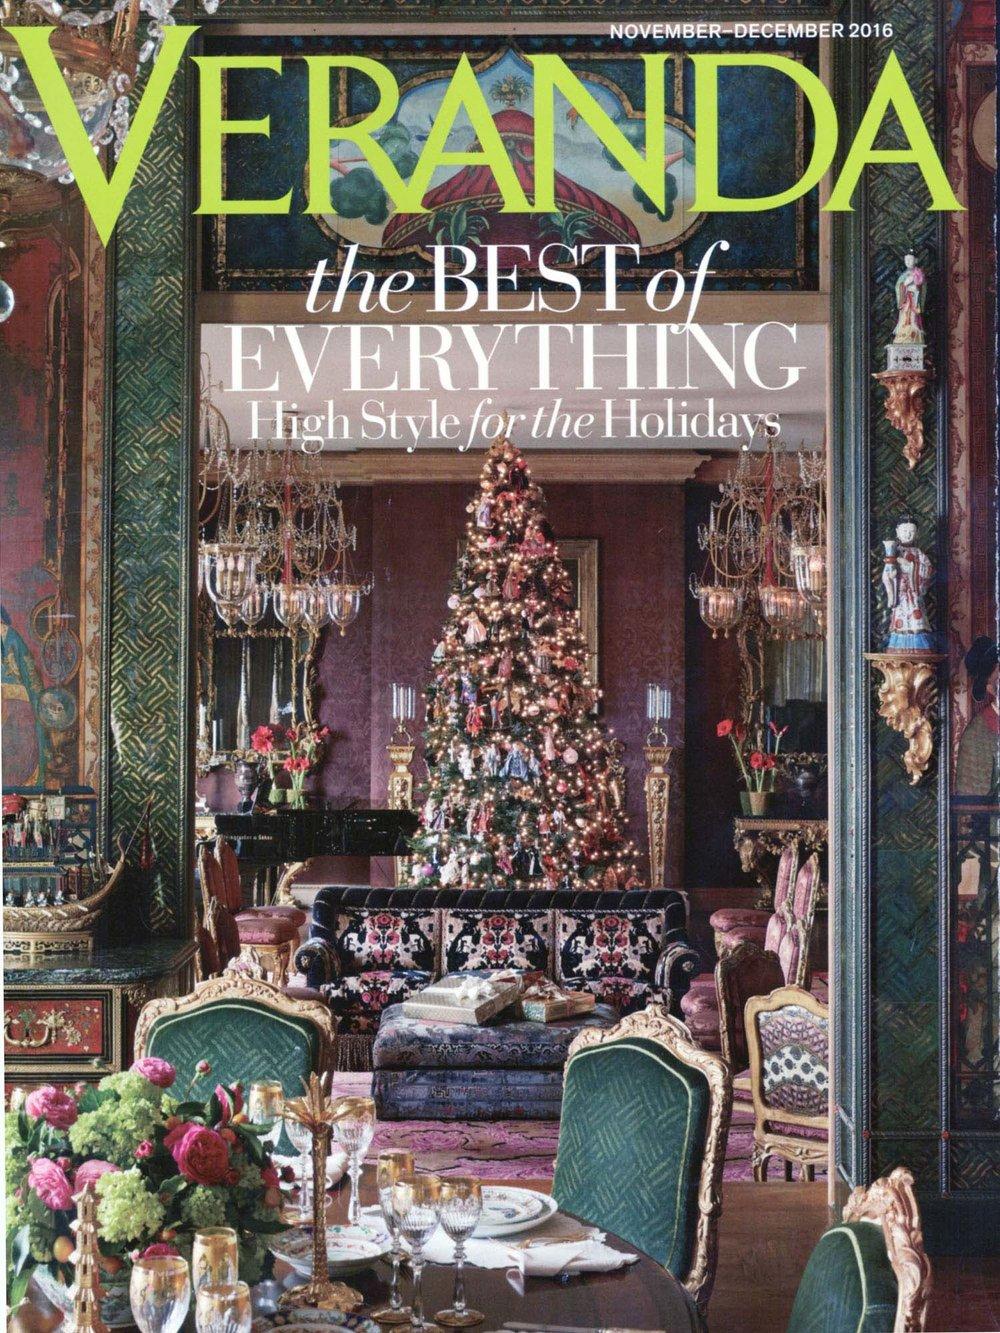 Veranda_cover_Nov-Dec2016.jpg